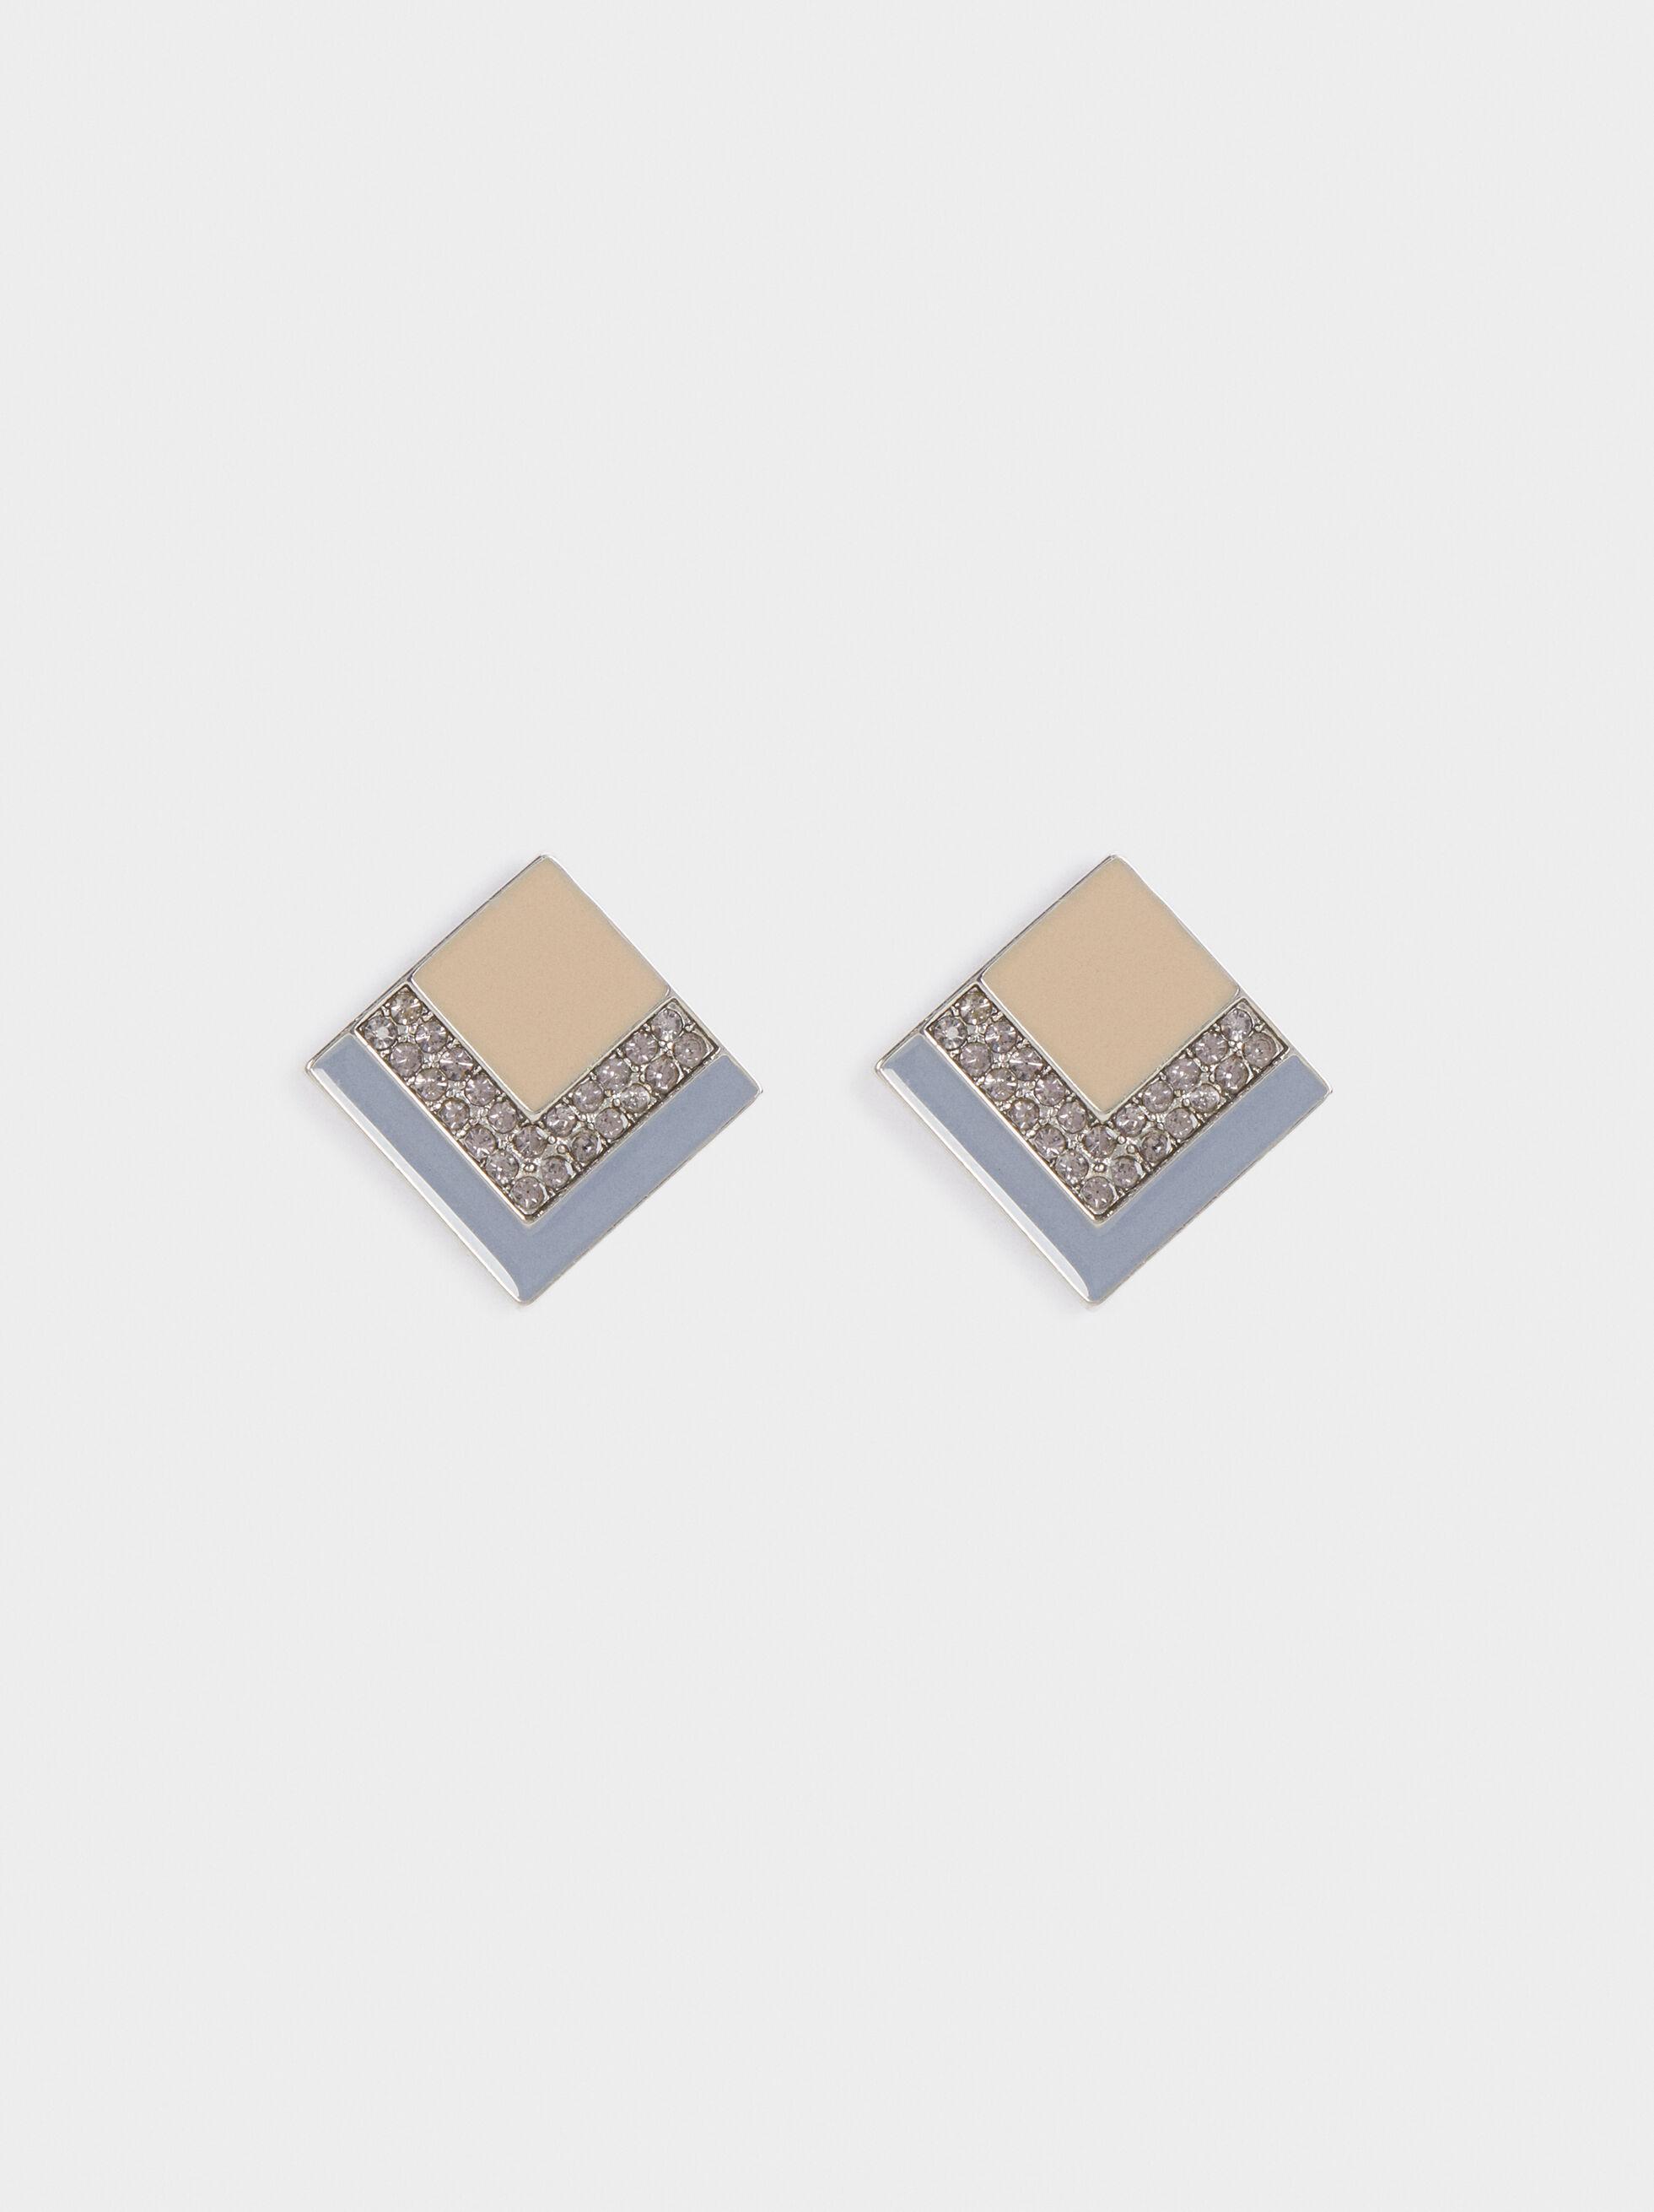 Magnolia Medium Diamond-Shaped Earrings, Multicolor, hi-res